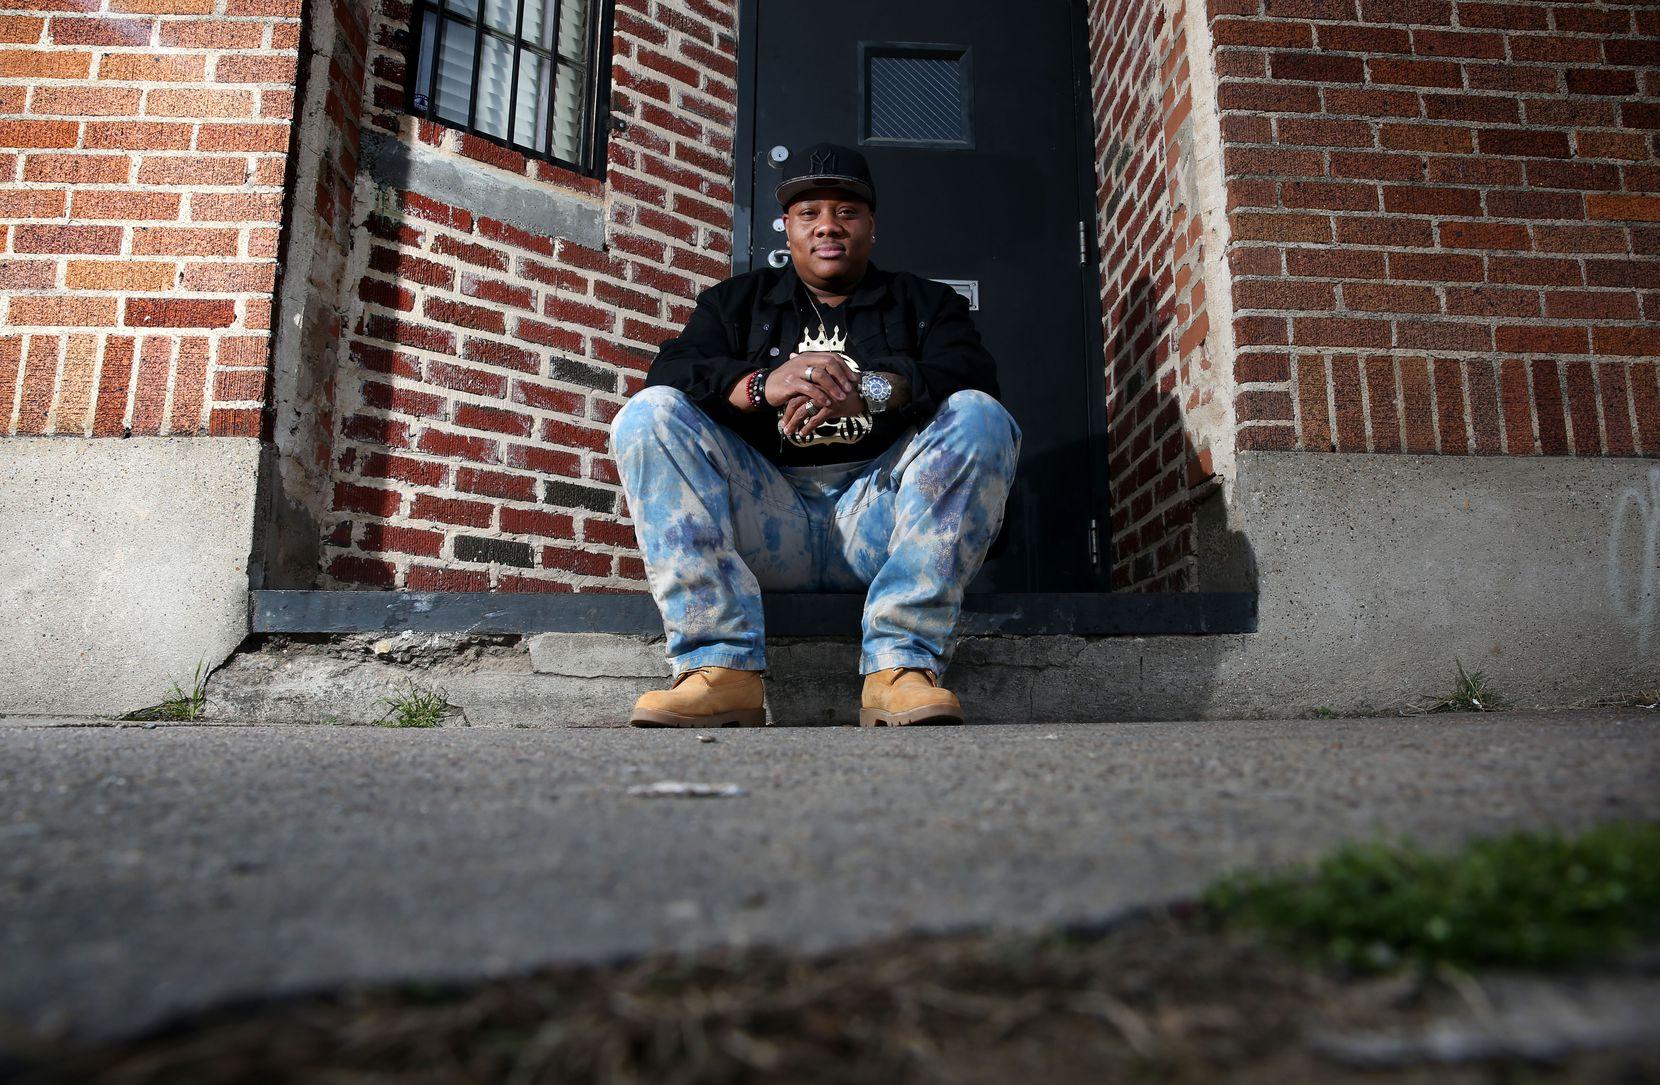 Trenton Johnson, who was recently named Mr. Black Trans Dallas. (Rose Baca/The Dallas Morning News)